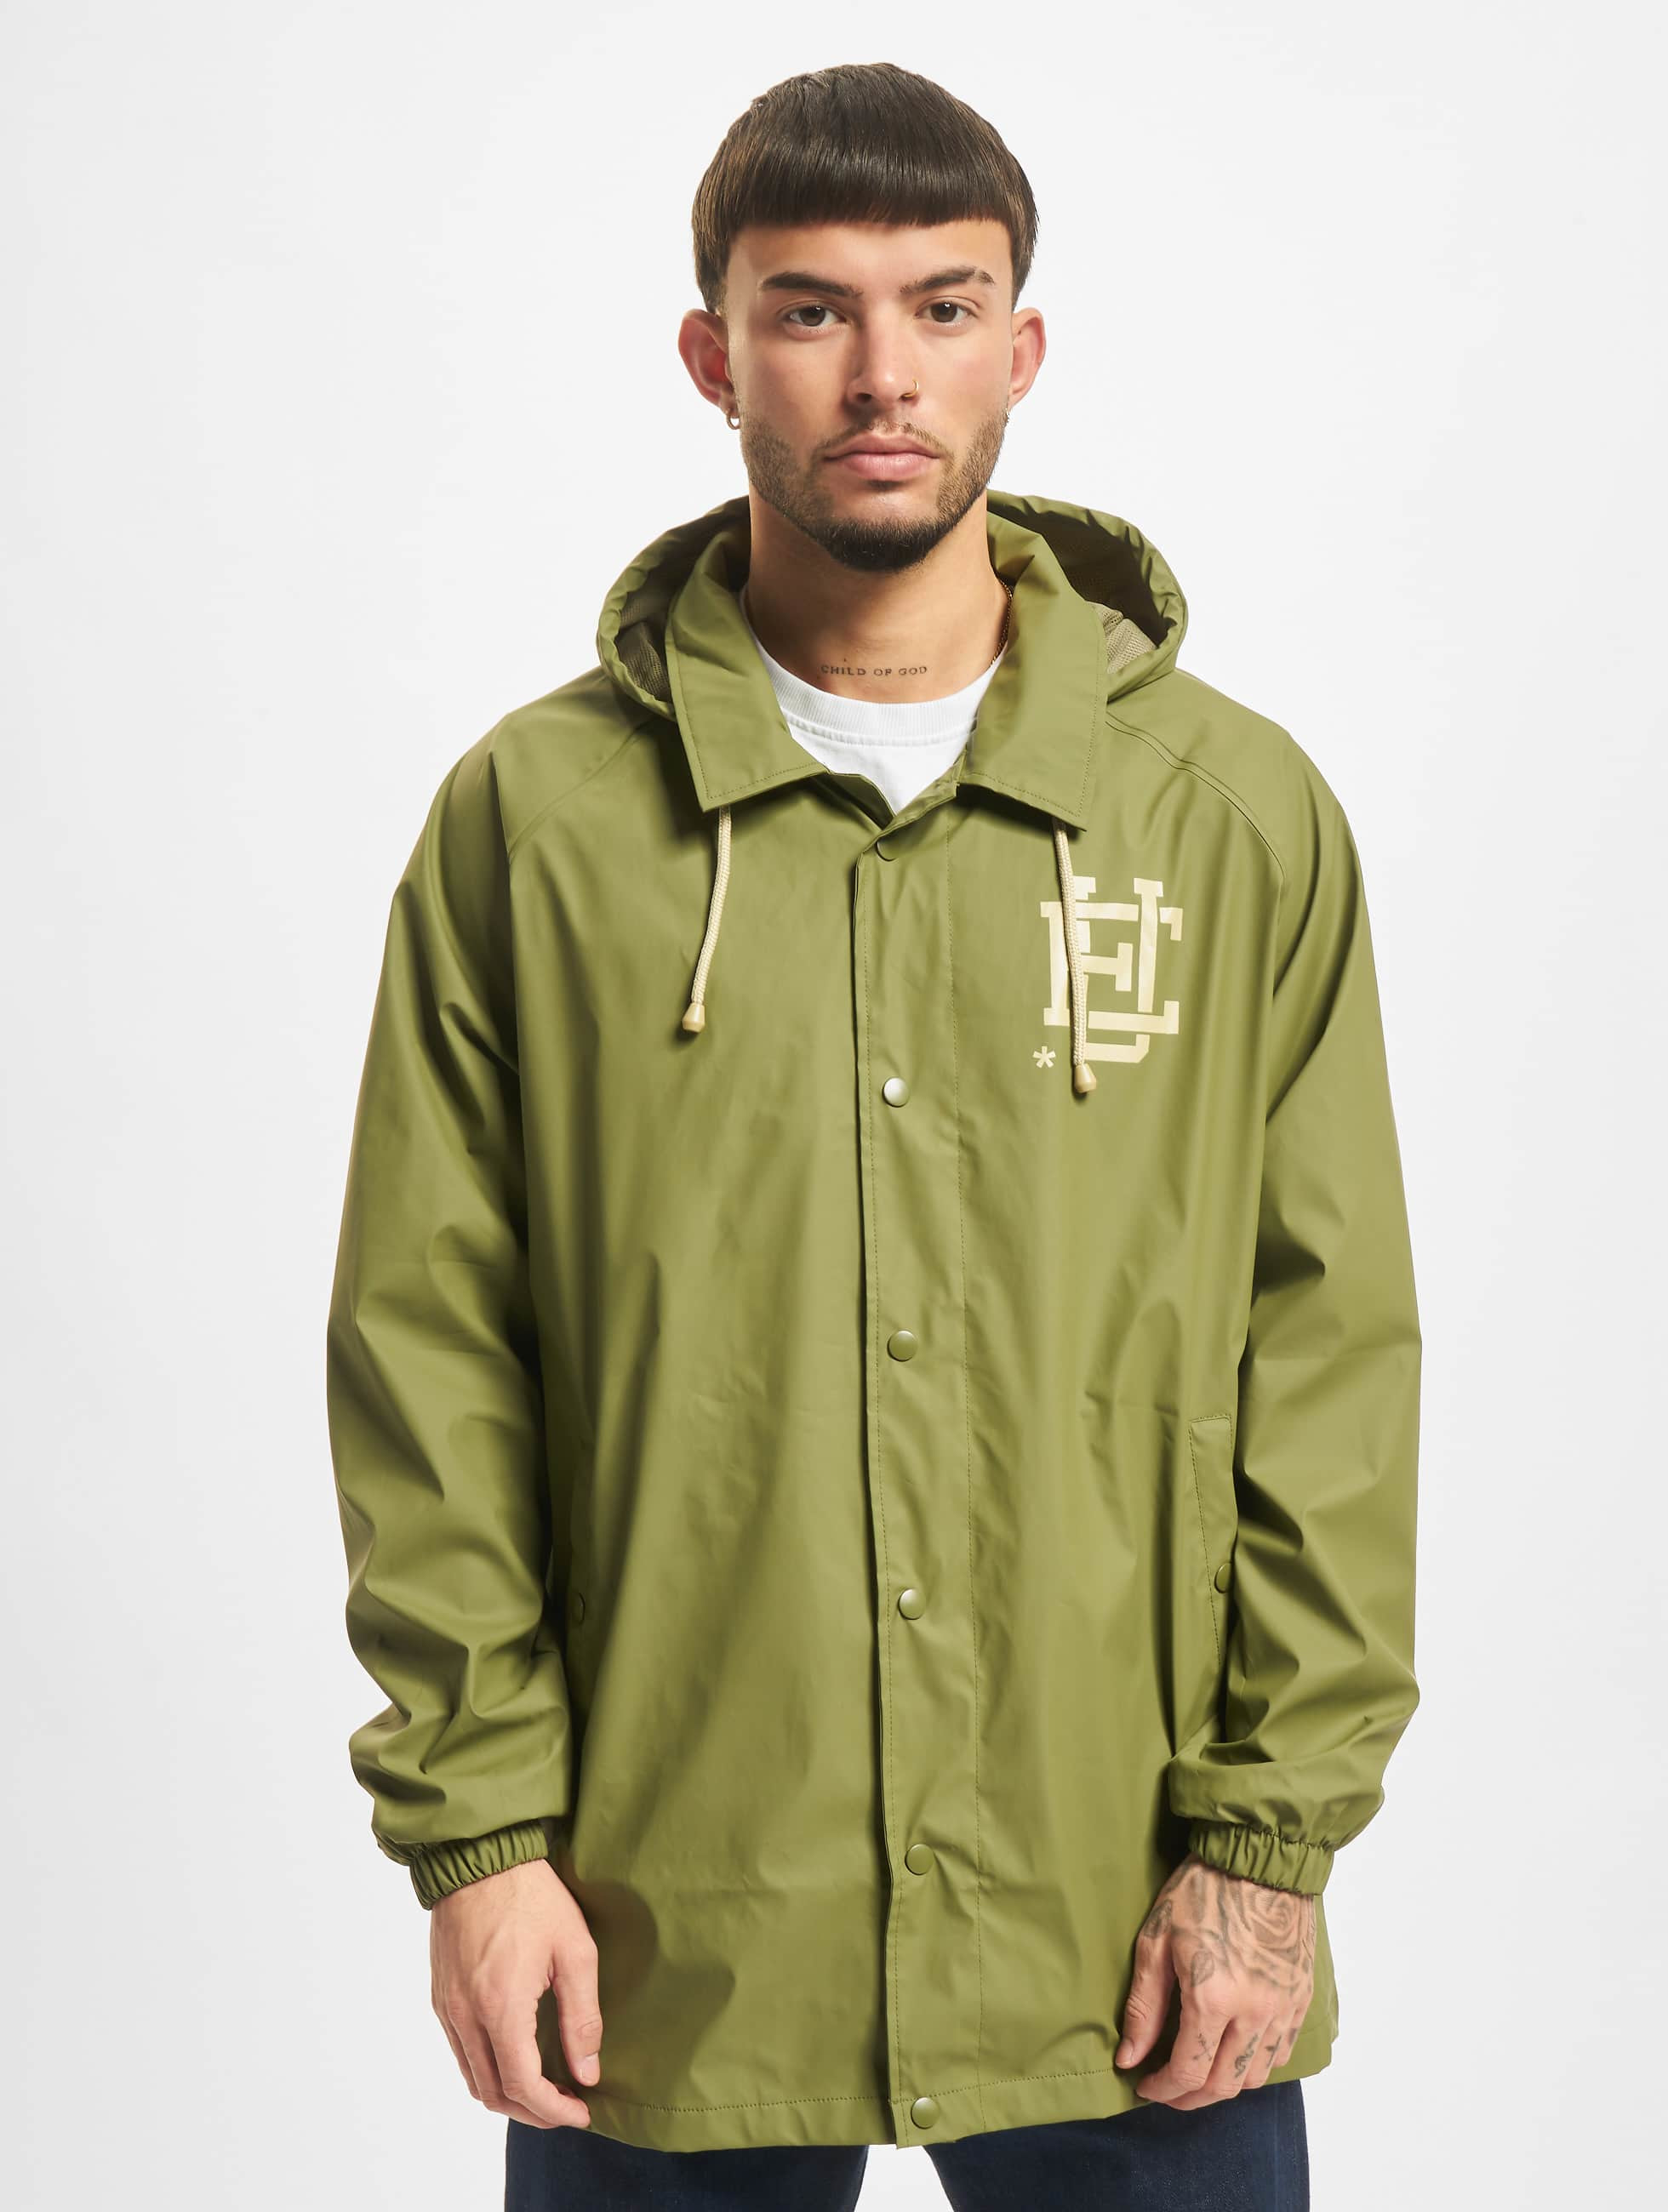 Ecko Unltd. Lightweight Jacket Raining Man camouflage